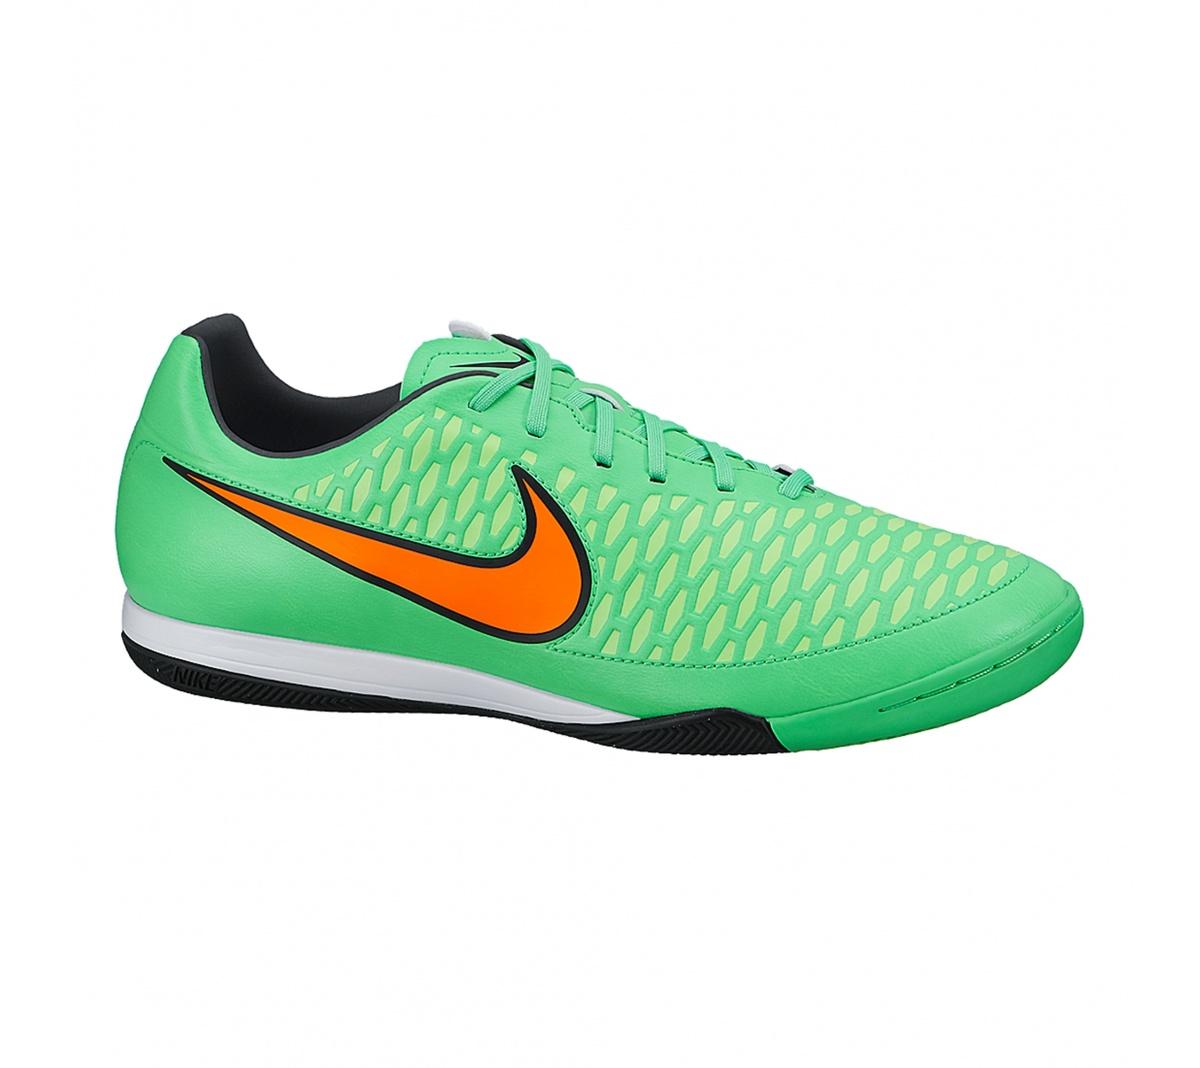 15bd62239459e Tênis Nike Magista Onda Futsal Tênis Nike Magista Onda Futsal ...